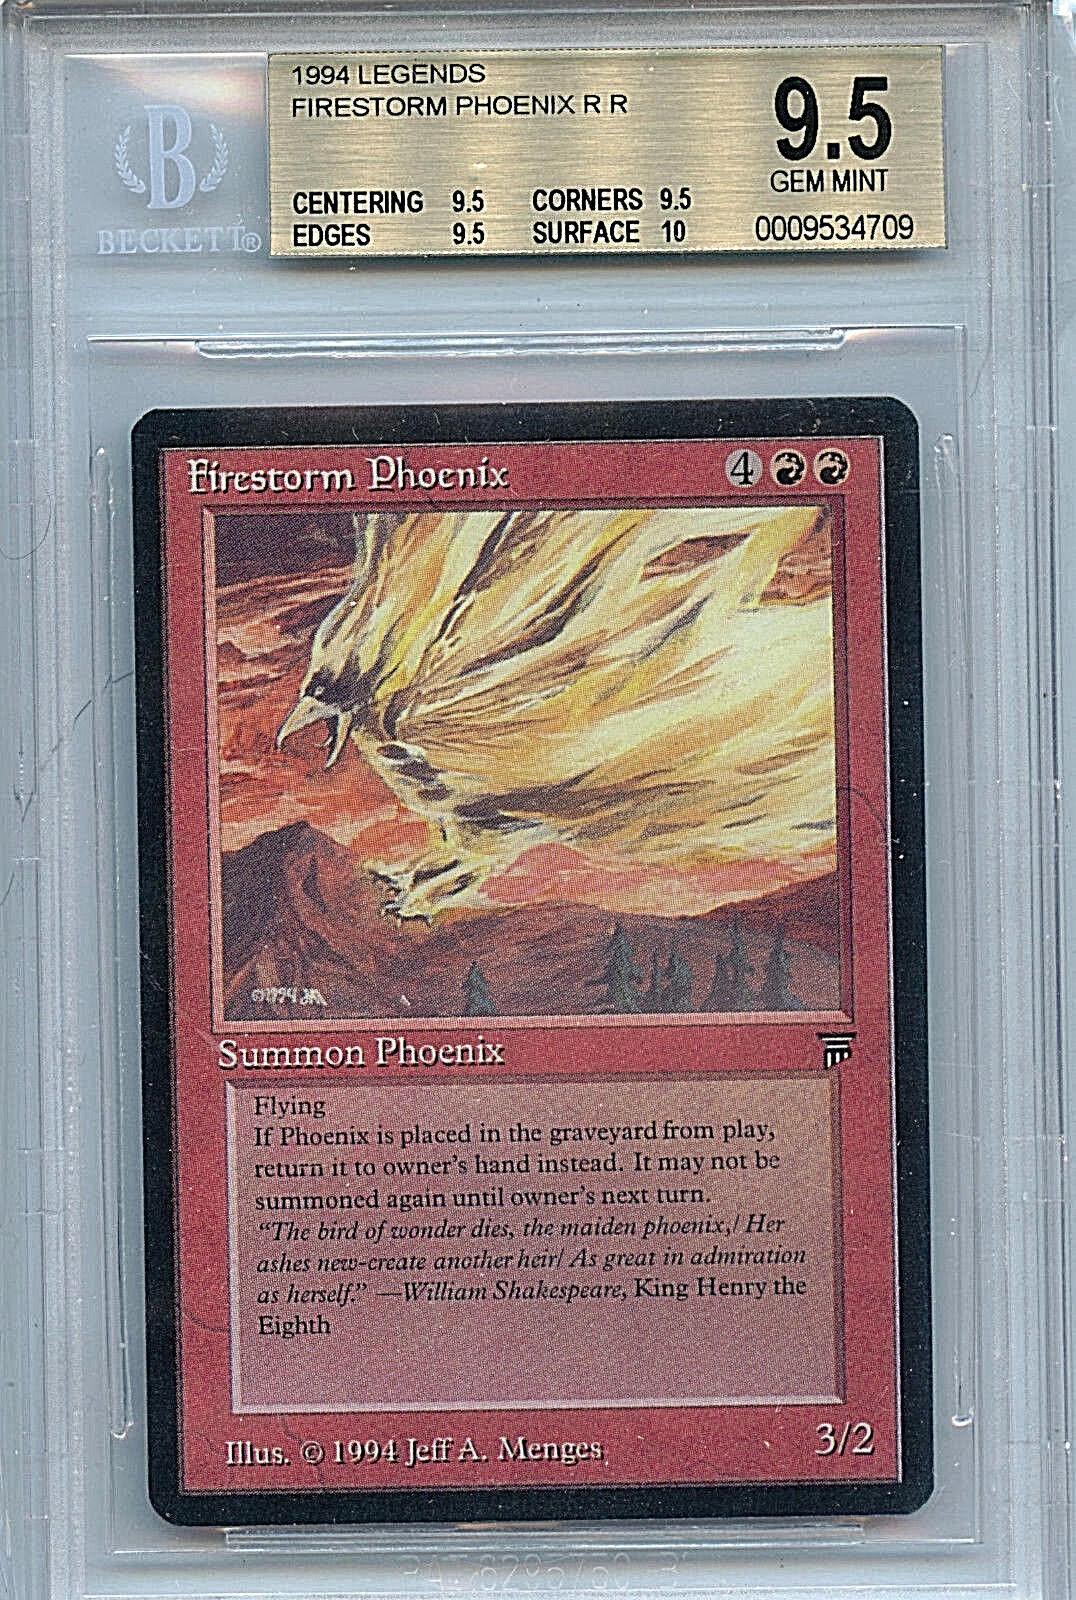 MTG Legends Firestorm Pheonix BGS 9.5 Gem Gem Gem Mint Magic WOTC card 4709 10536e